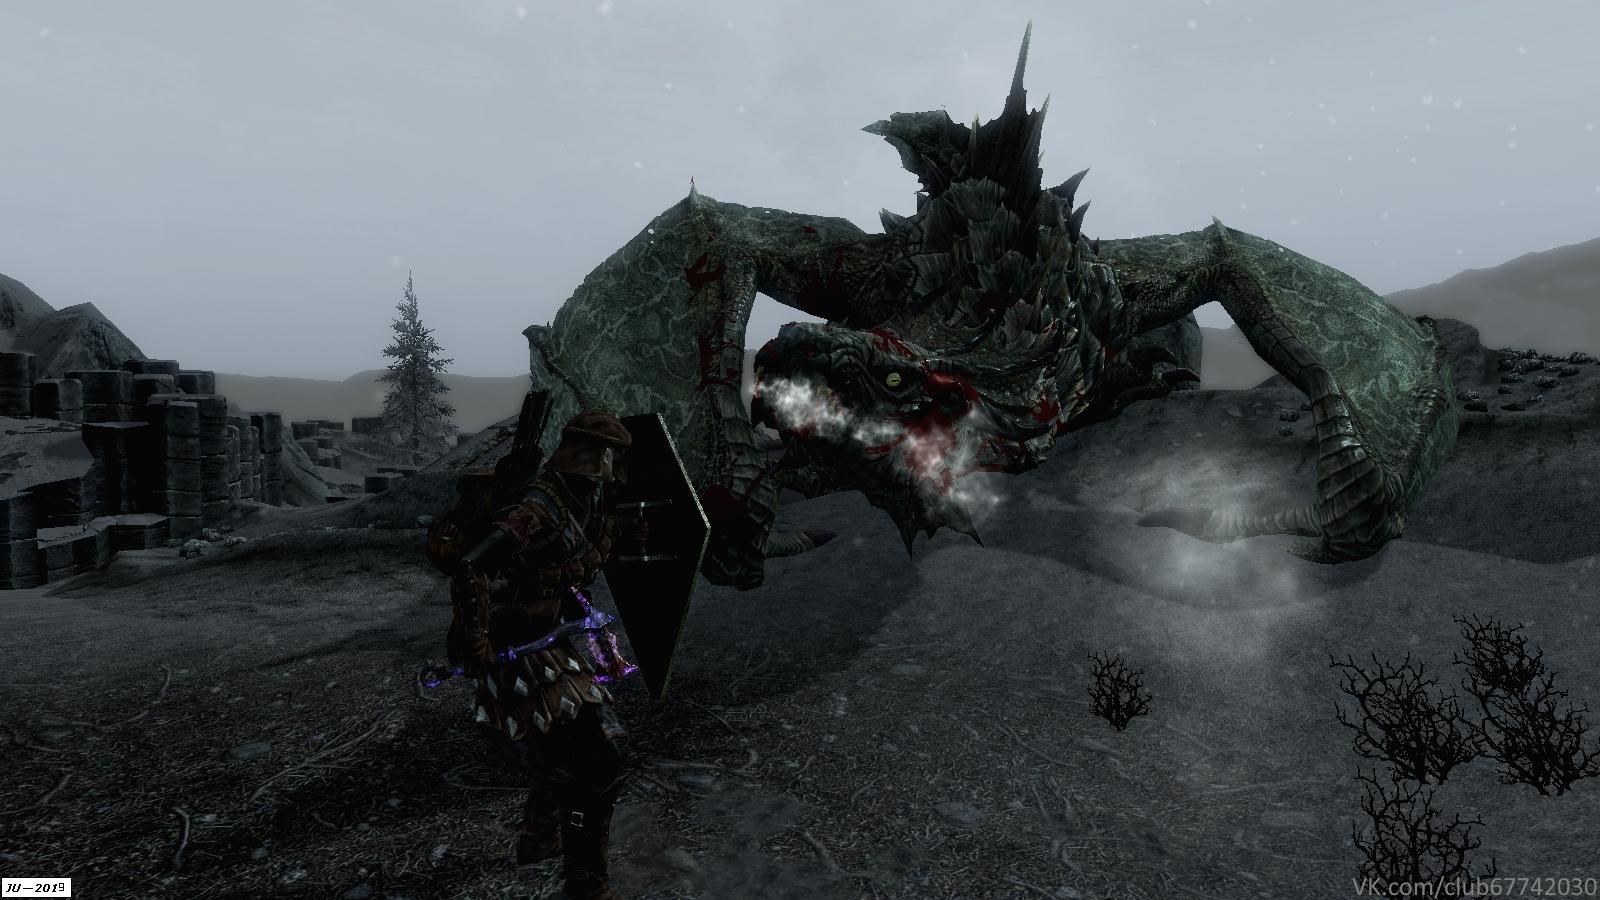 Дракон на Солстейме. - Elder Scrolls 5: Skyrim, the Дракон, легионер, Солстейм